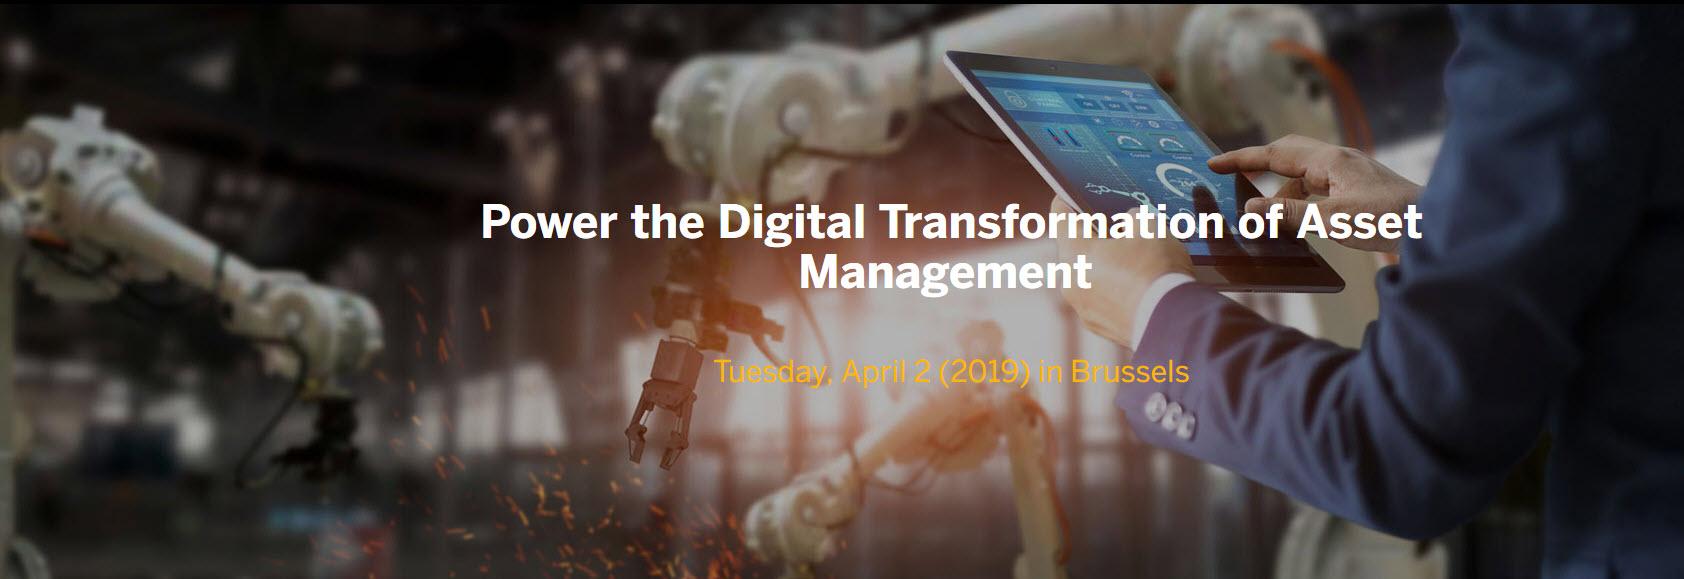 Power the Digital Transformation of Asset Management